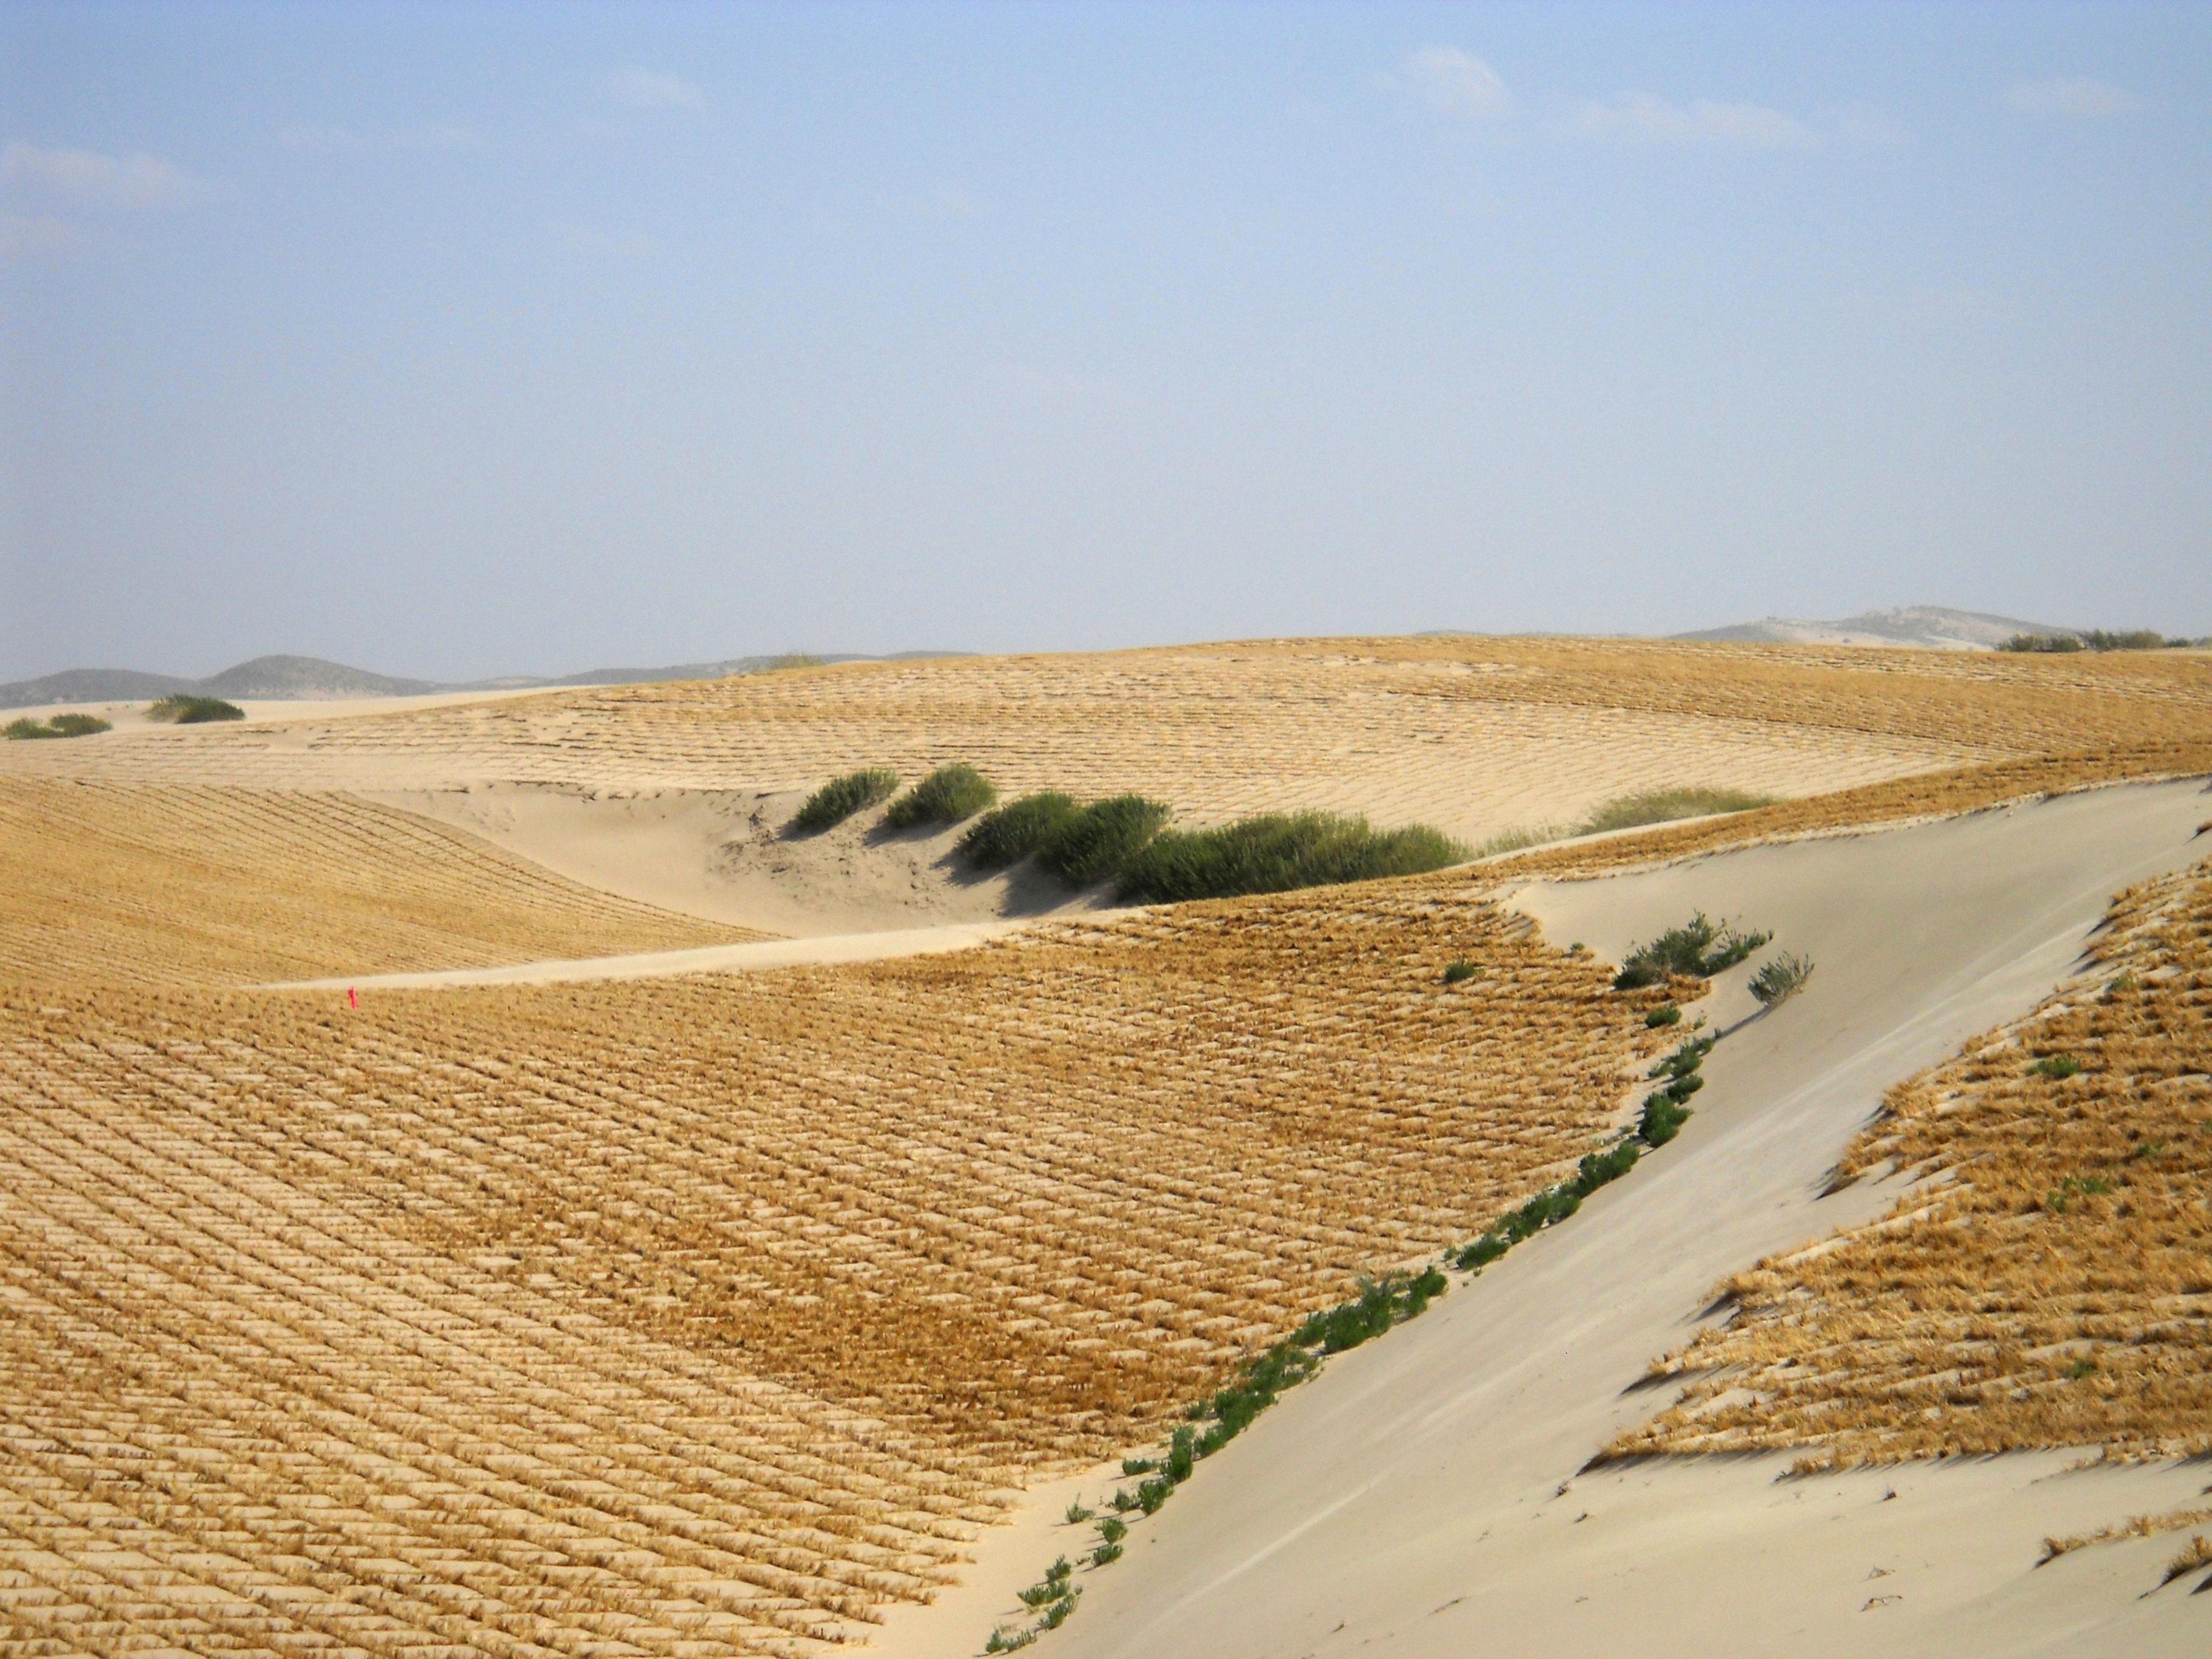 desertification - photo #9